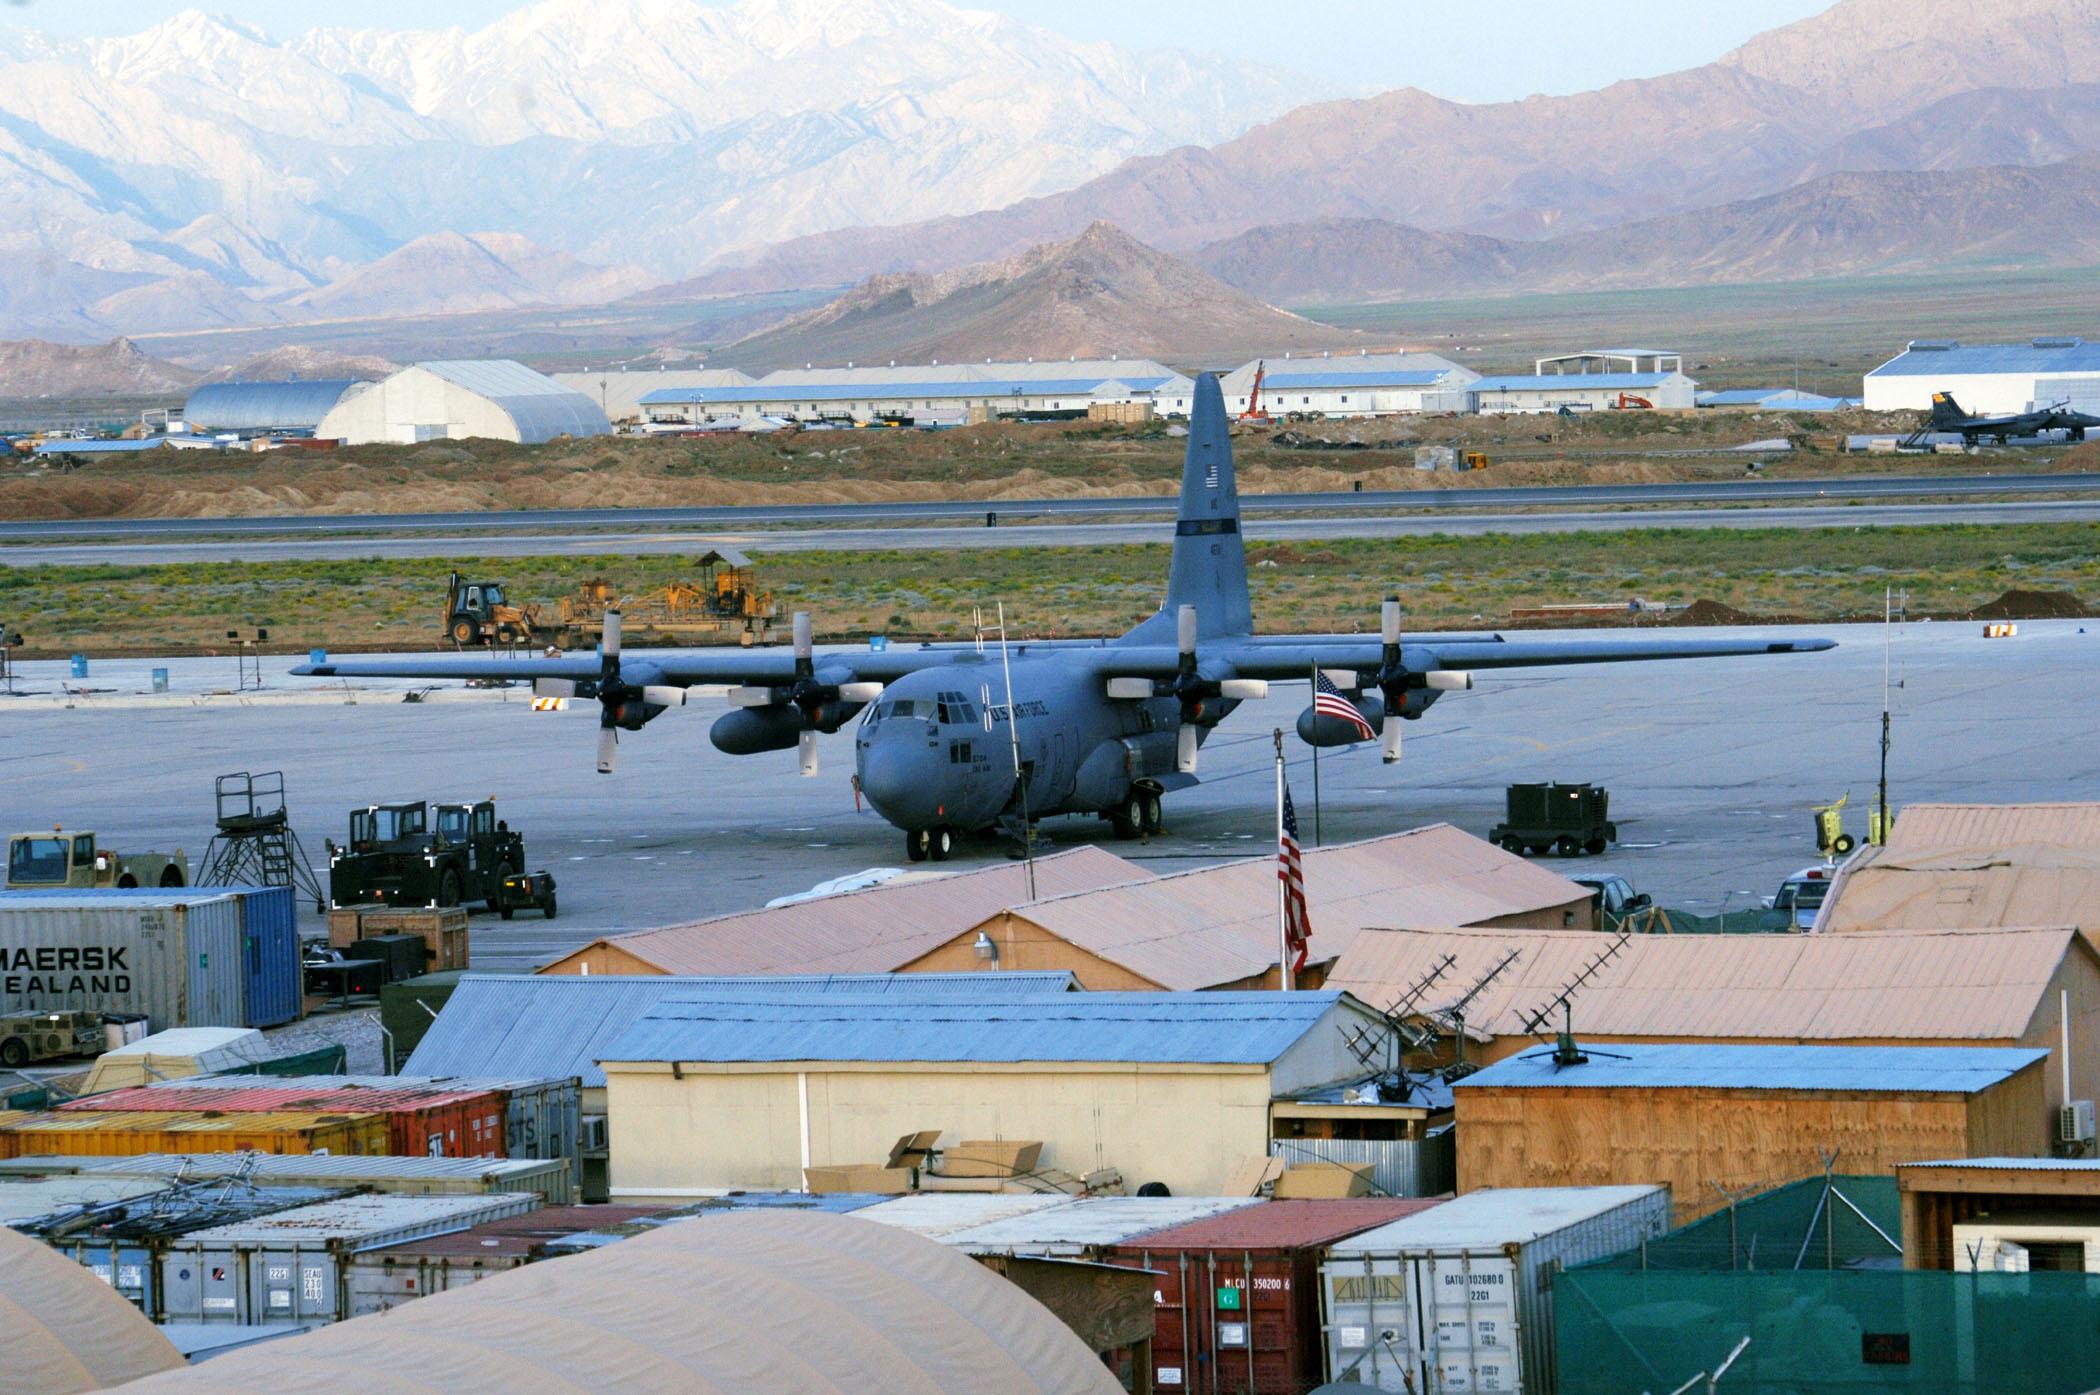 Bagram Airfield, Afghanistan after a rainstorm